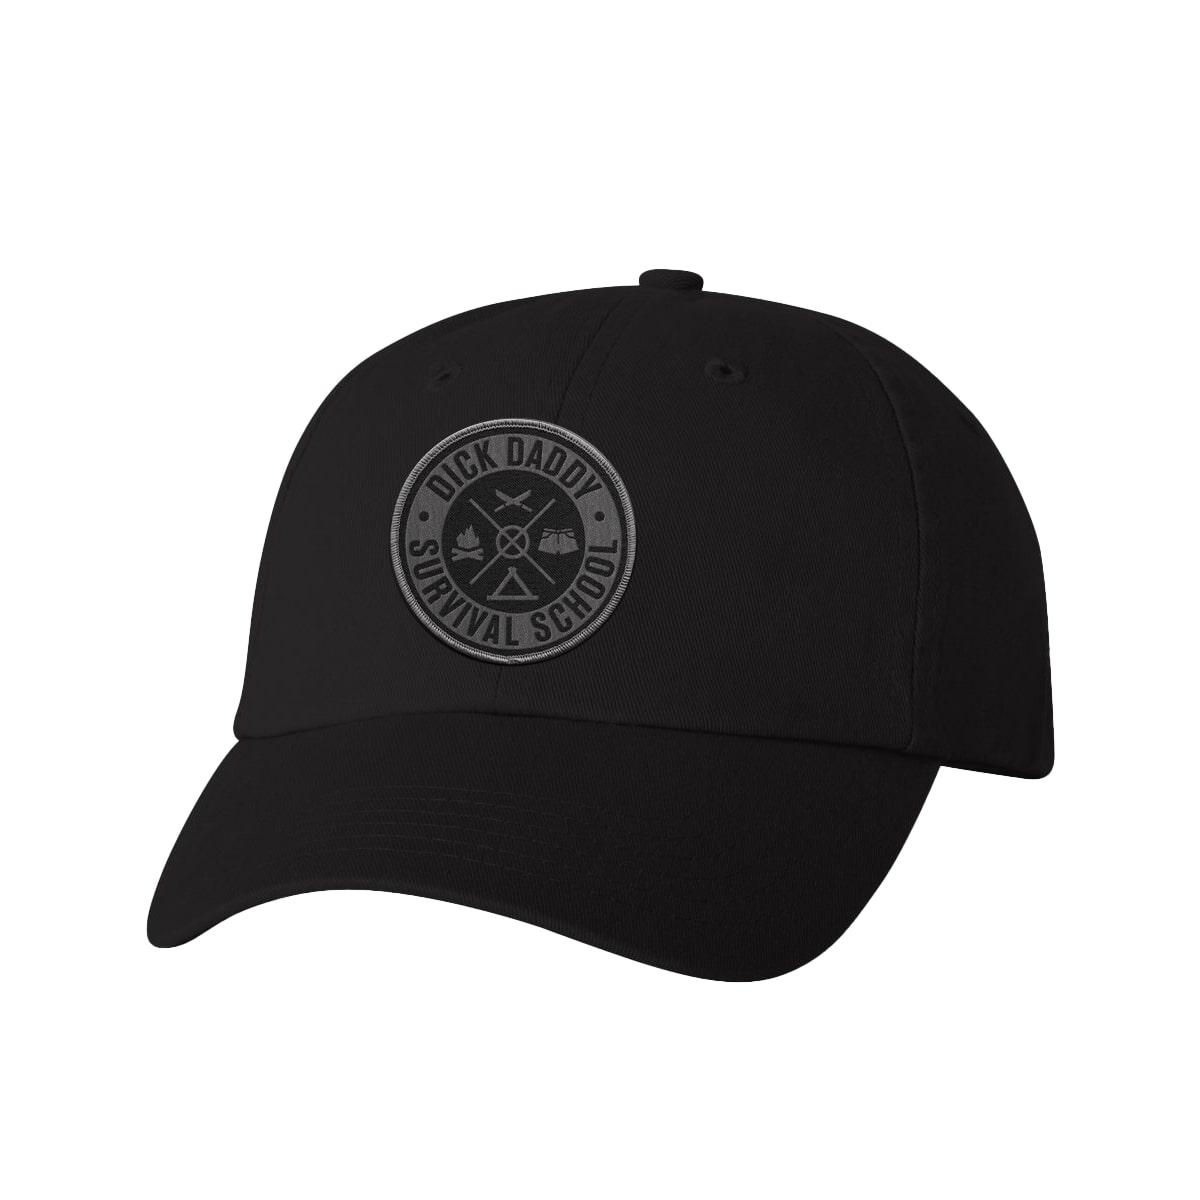 DDSS Patch Black Dad Hat